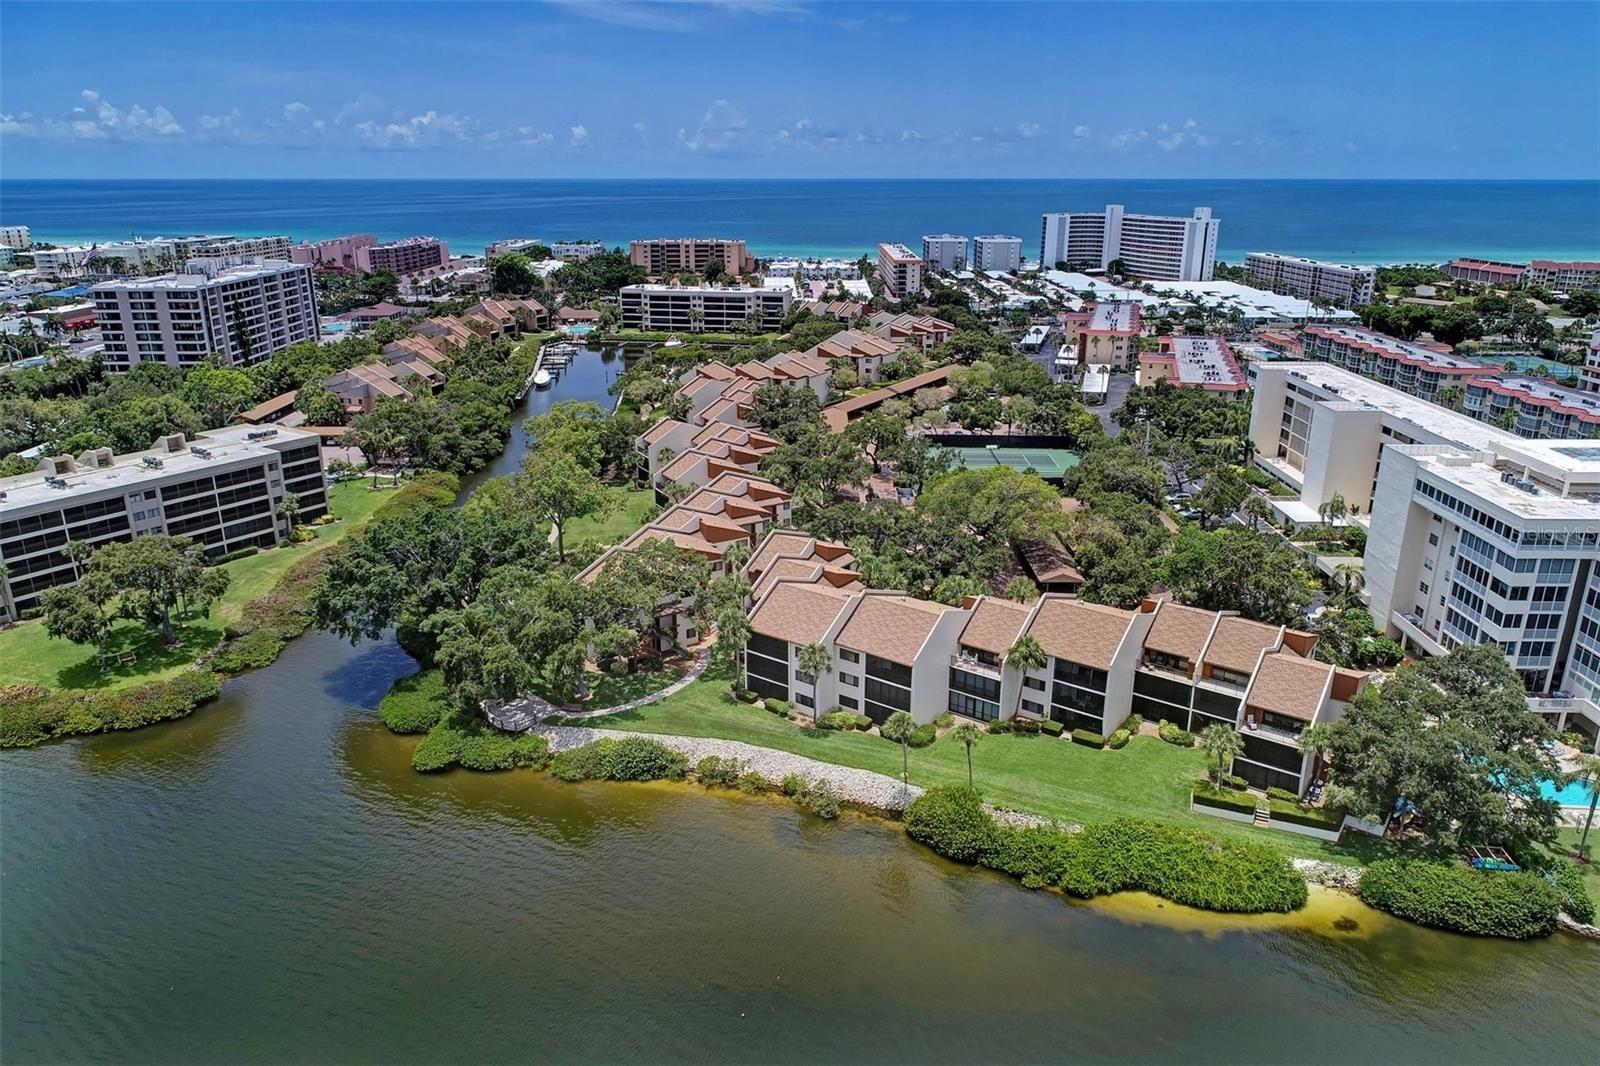 1700 COVE II PLACE #313, Sarasota, FL 34242 - #: A4509576